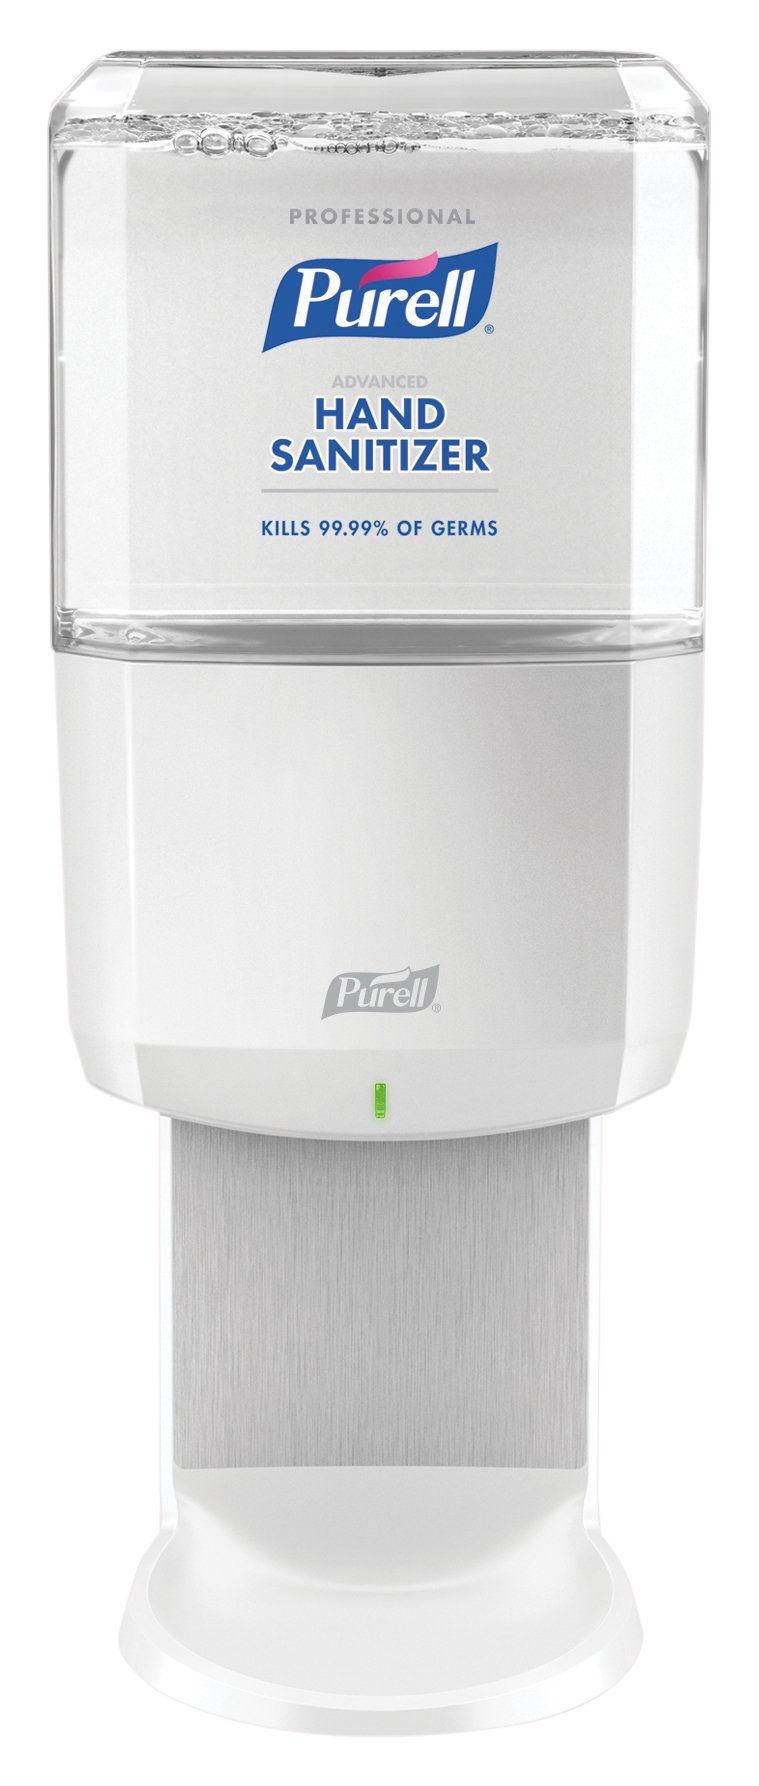 Purell 6454-1W PURELL Professional Advanced Hand Sanitizer Kit, Foam Refill + 1 ES6 White Dispenser